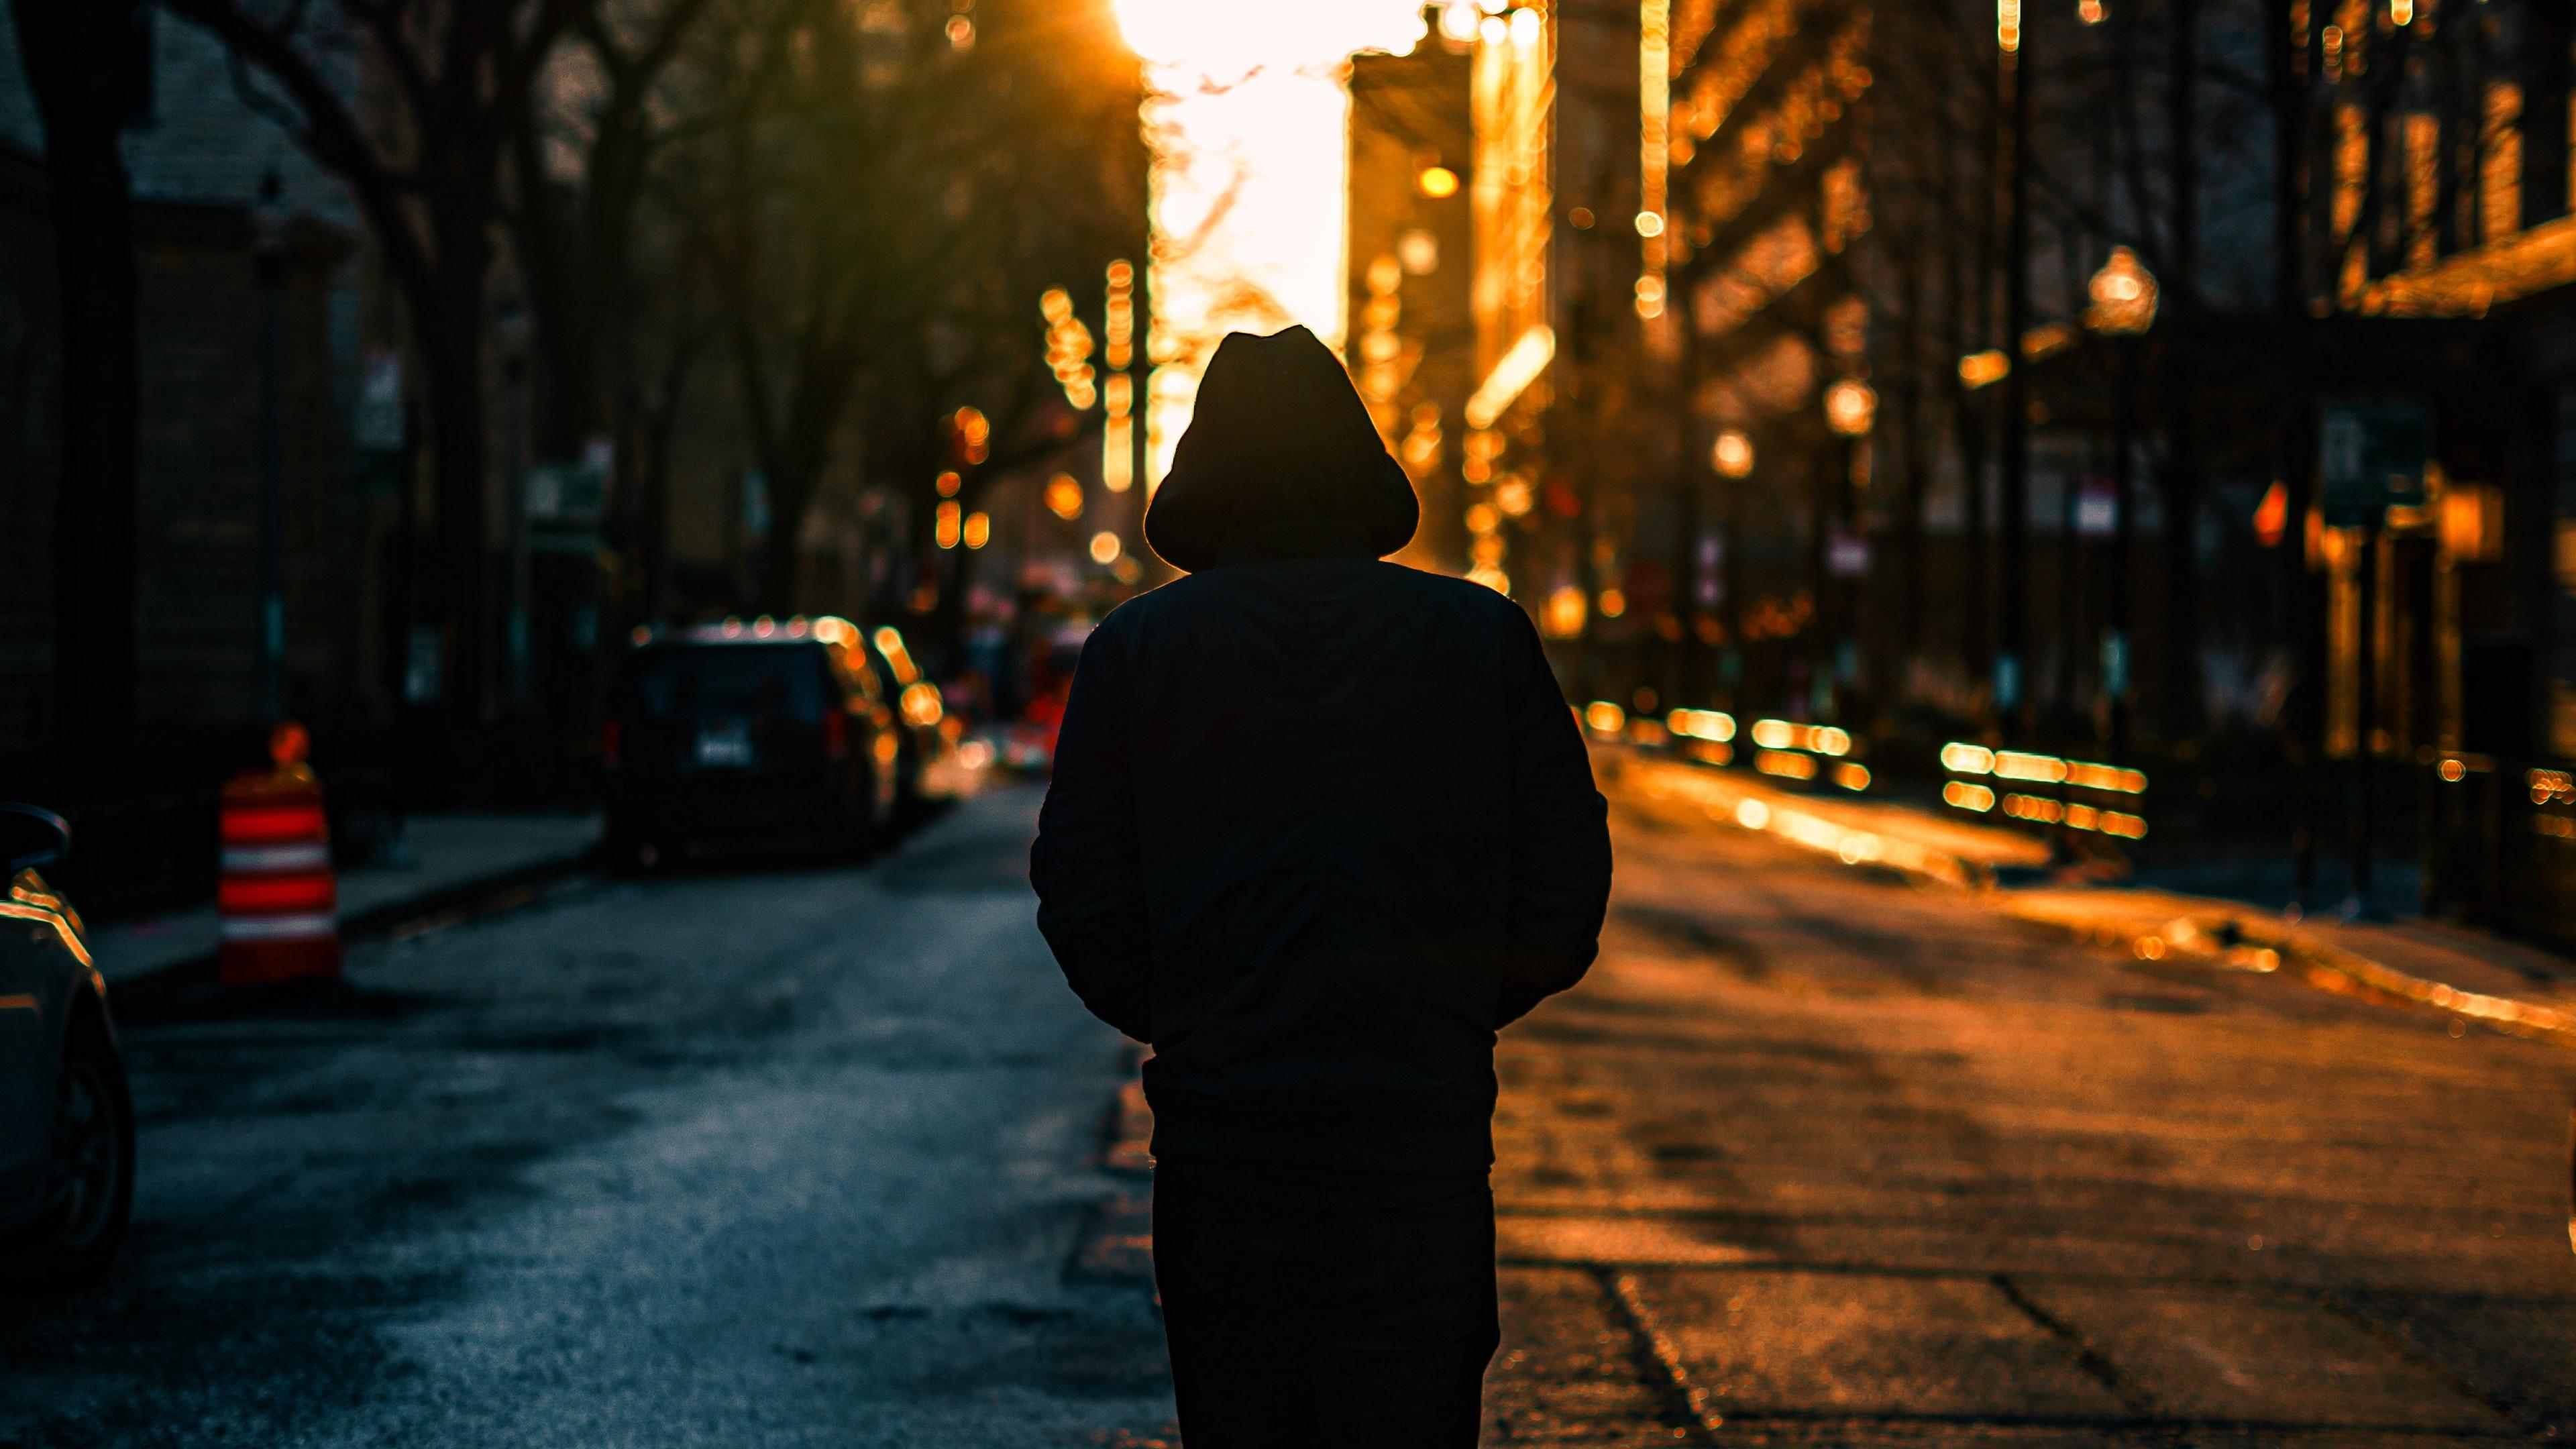 loneliness man hood city 4k 1538068044 - loneliness, man, hood, city 4k - Man, loneliness, Hood